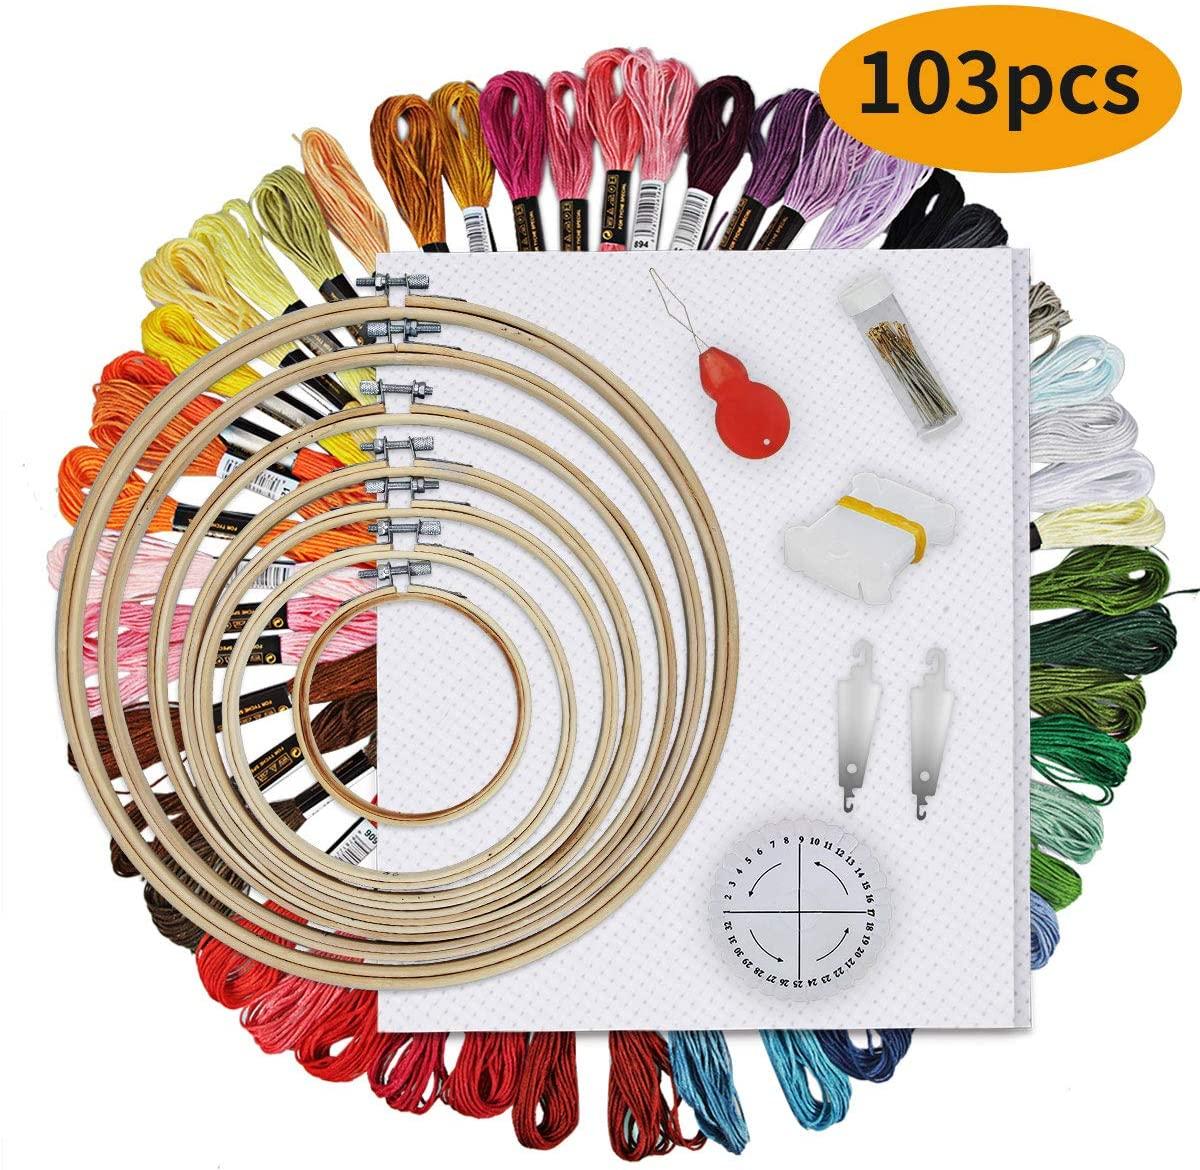 HAUSPROFI Embroidery Kits 103 Pcs, Full Range of Embroidery Starter Kits, Embroidery Wreath 7 Pcs, 50 Colors Threads, Winding Cards 10 Pcs, Embroidery Needle 30 Pcs, Needle, Cross-Stitch Fabric